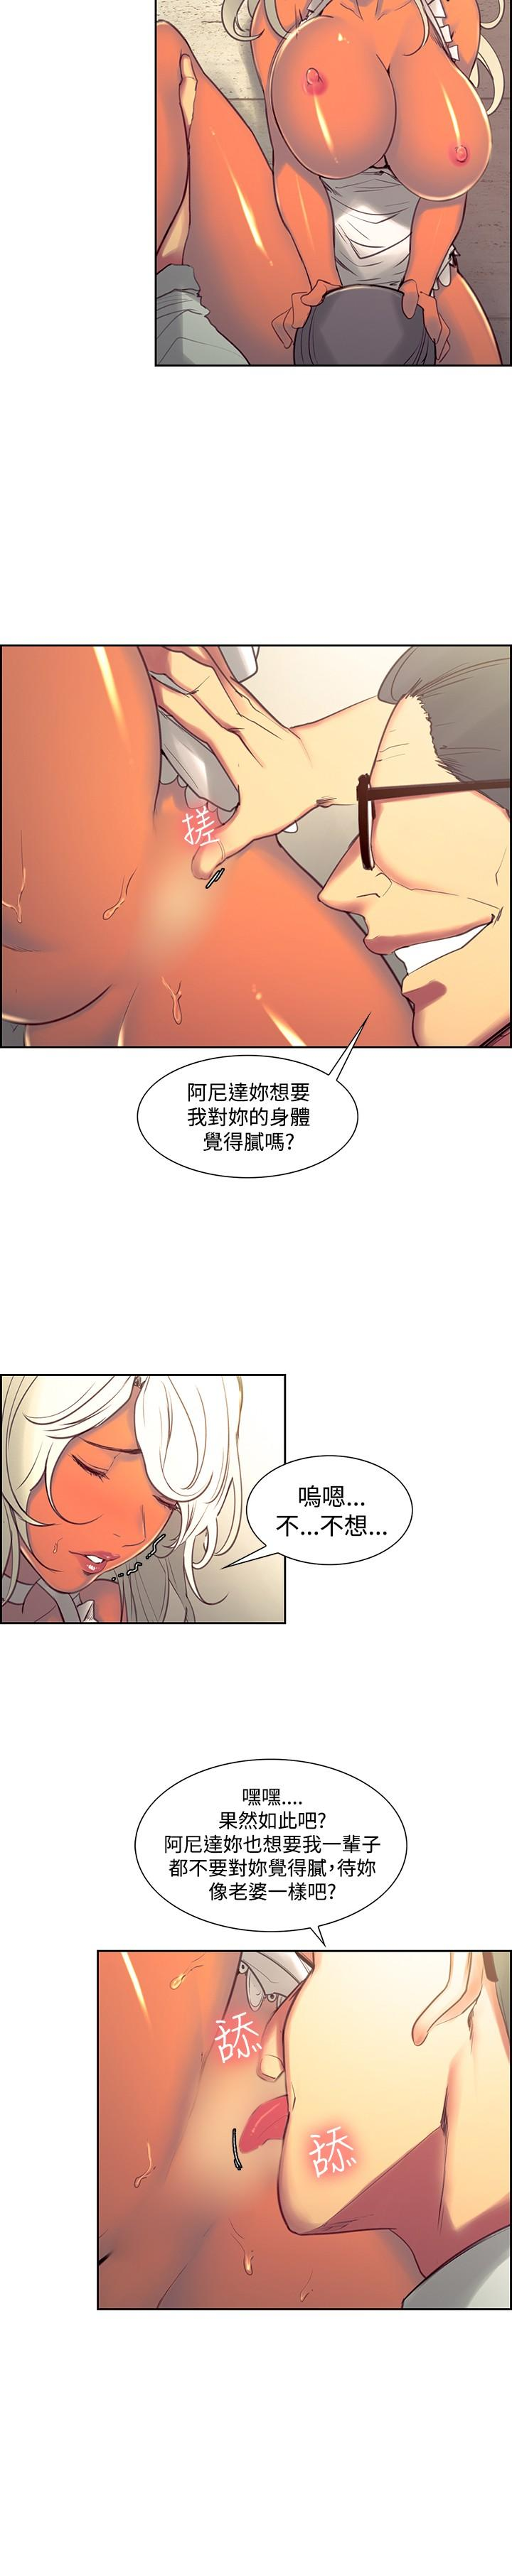 Domesticate the Housekeeper 调教家政妇 Ch.29~39 41